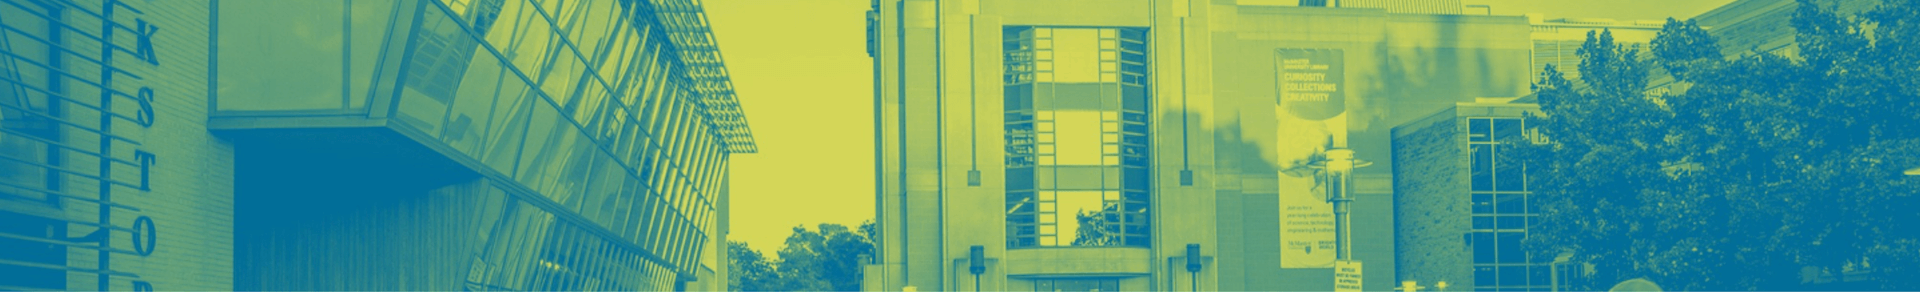 Modern McMaster campus buildings